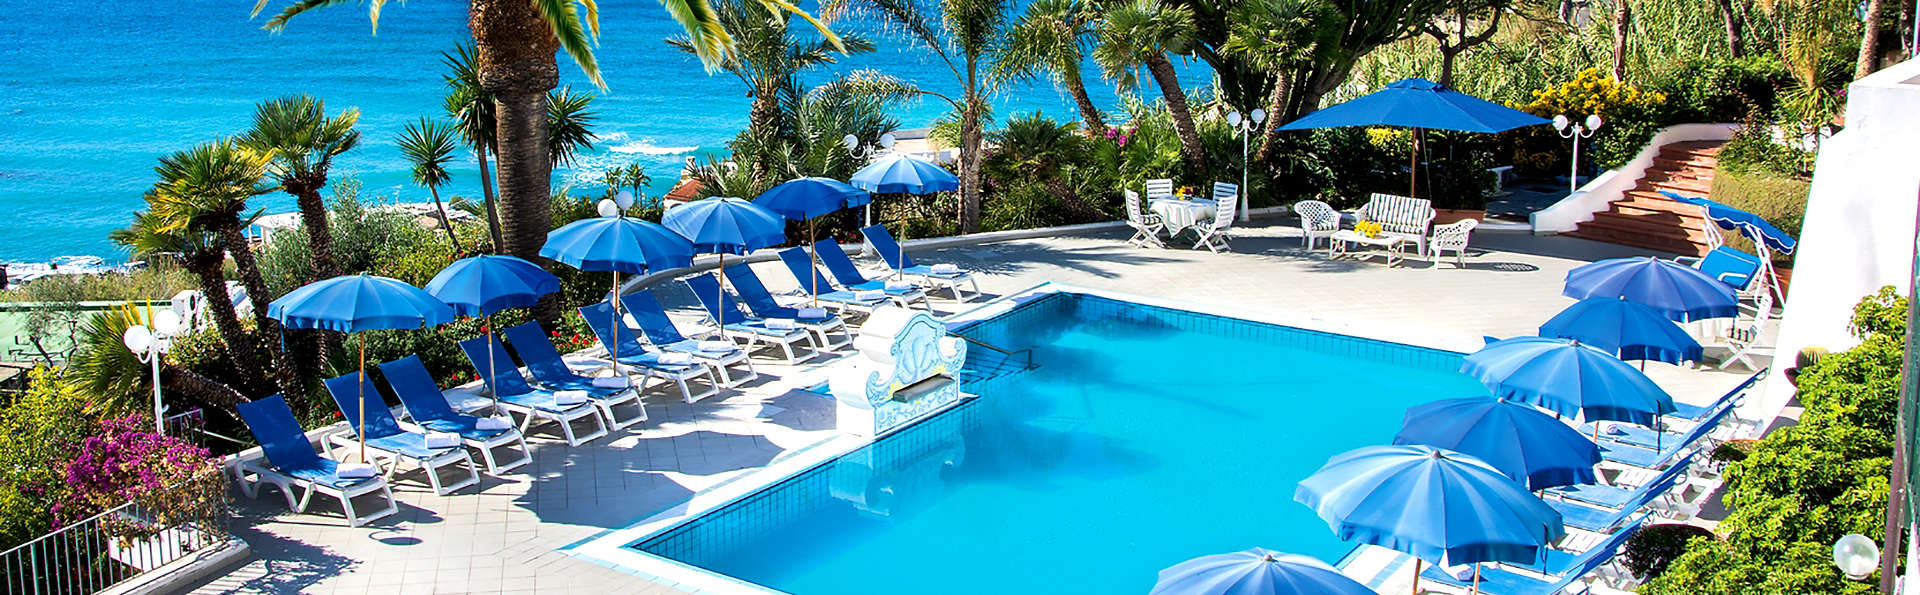 Hotel Capizzo - EDIT_NEW_POOL4.jpg